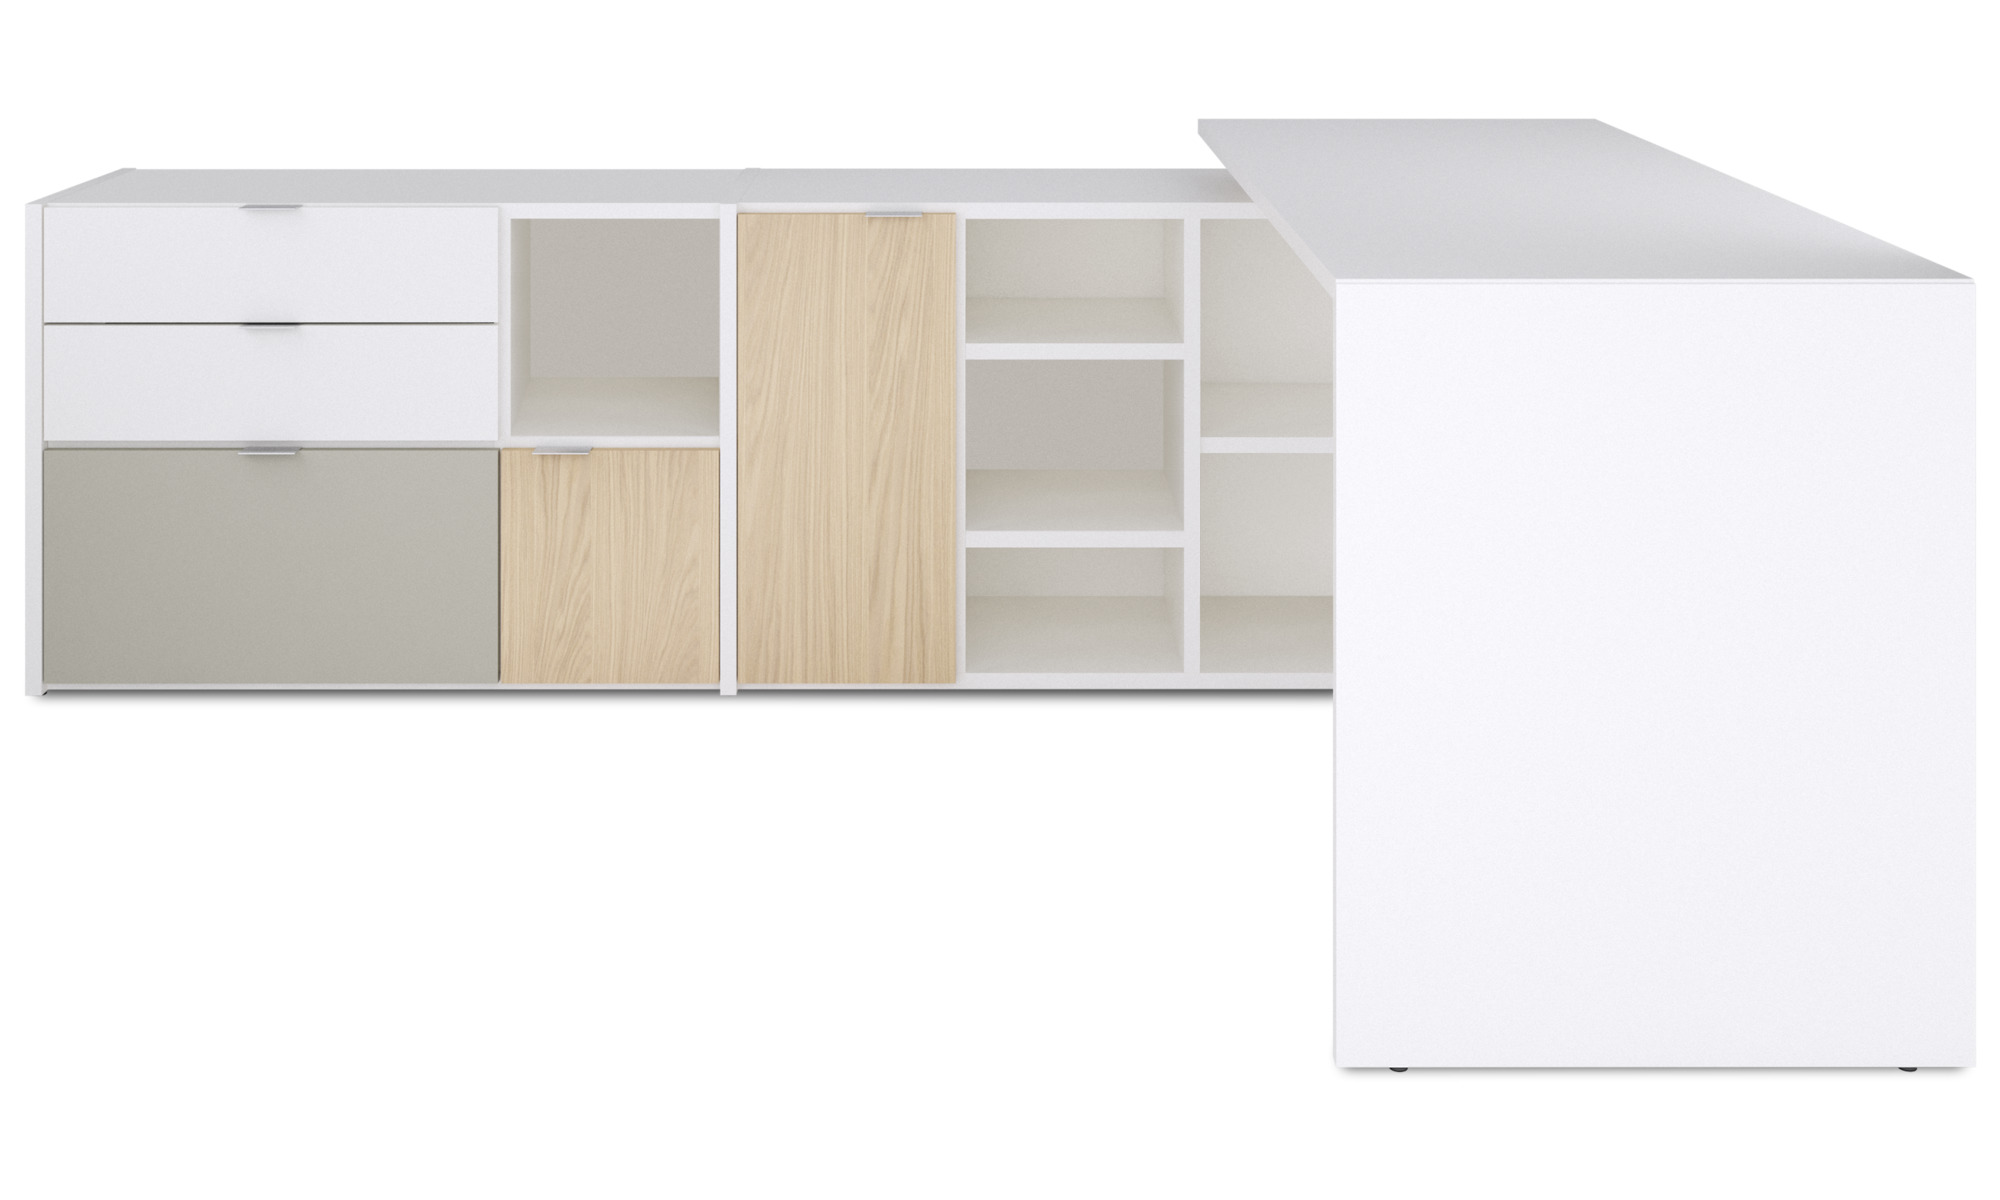 Desks - Copenhagen office system - White - Lacquered